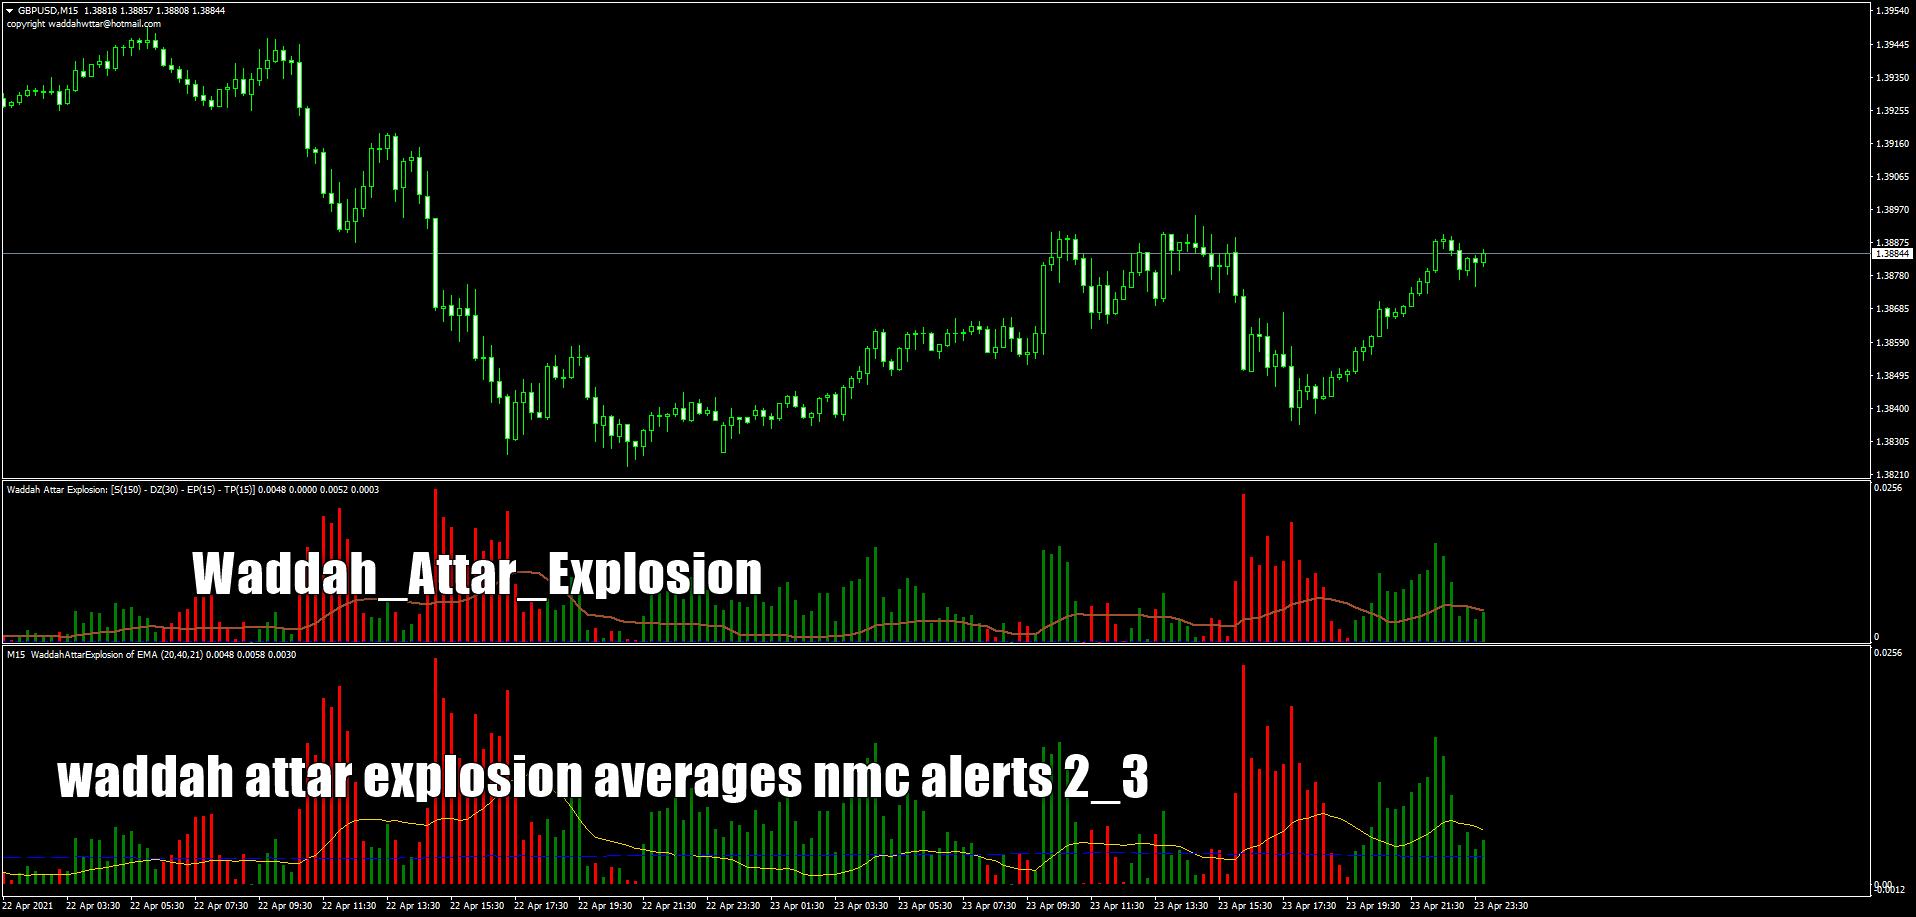 Waddah_Attar_Explosionとwaddah attar explosion averages nmc alerts 2_3の違い